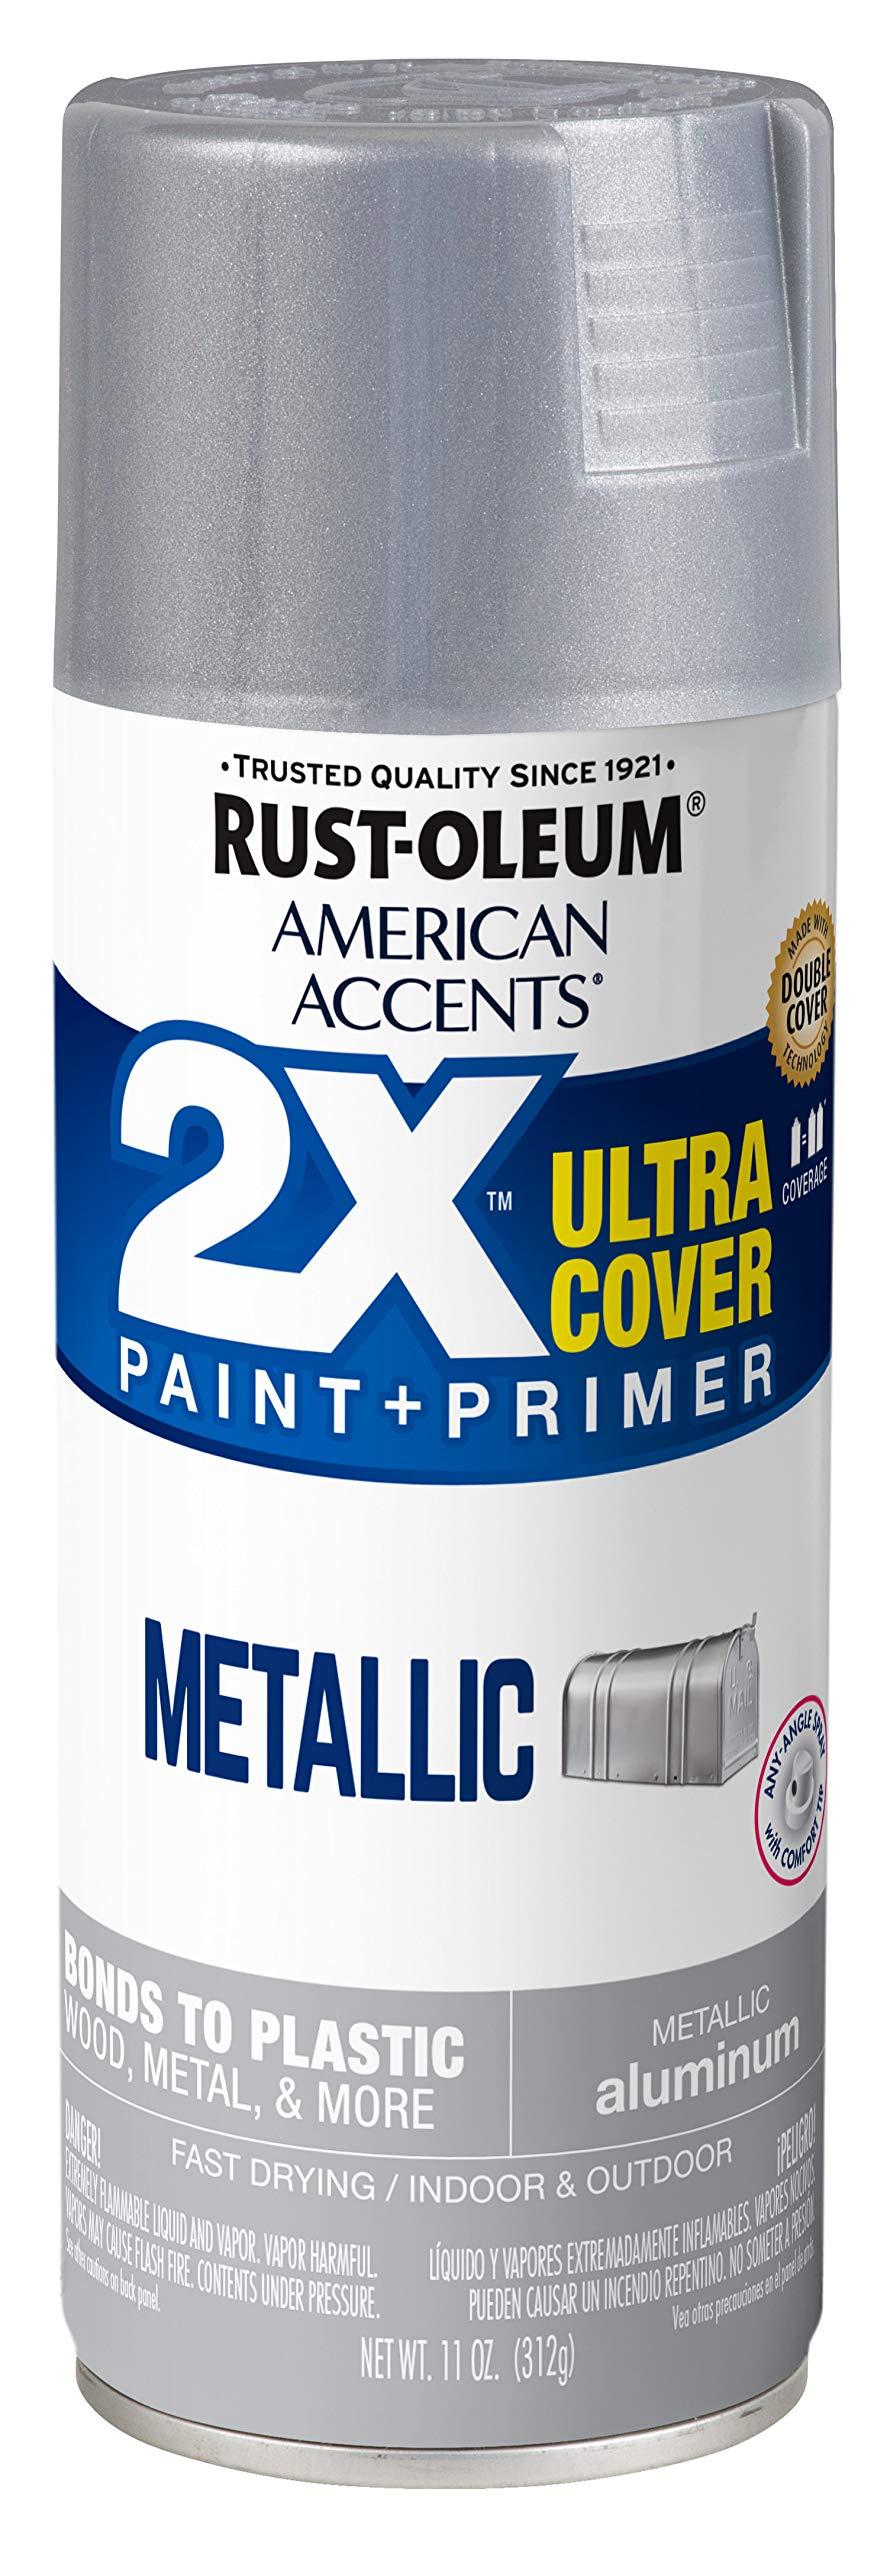 Rust-Oleum 327907 American Accents 2X Ultra Cover Spray Paint, 11 oz, Metallic Aluminum